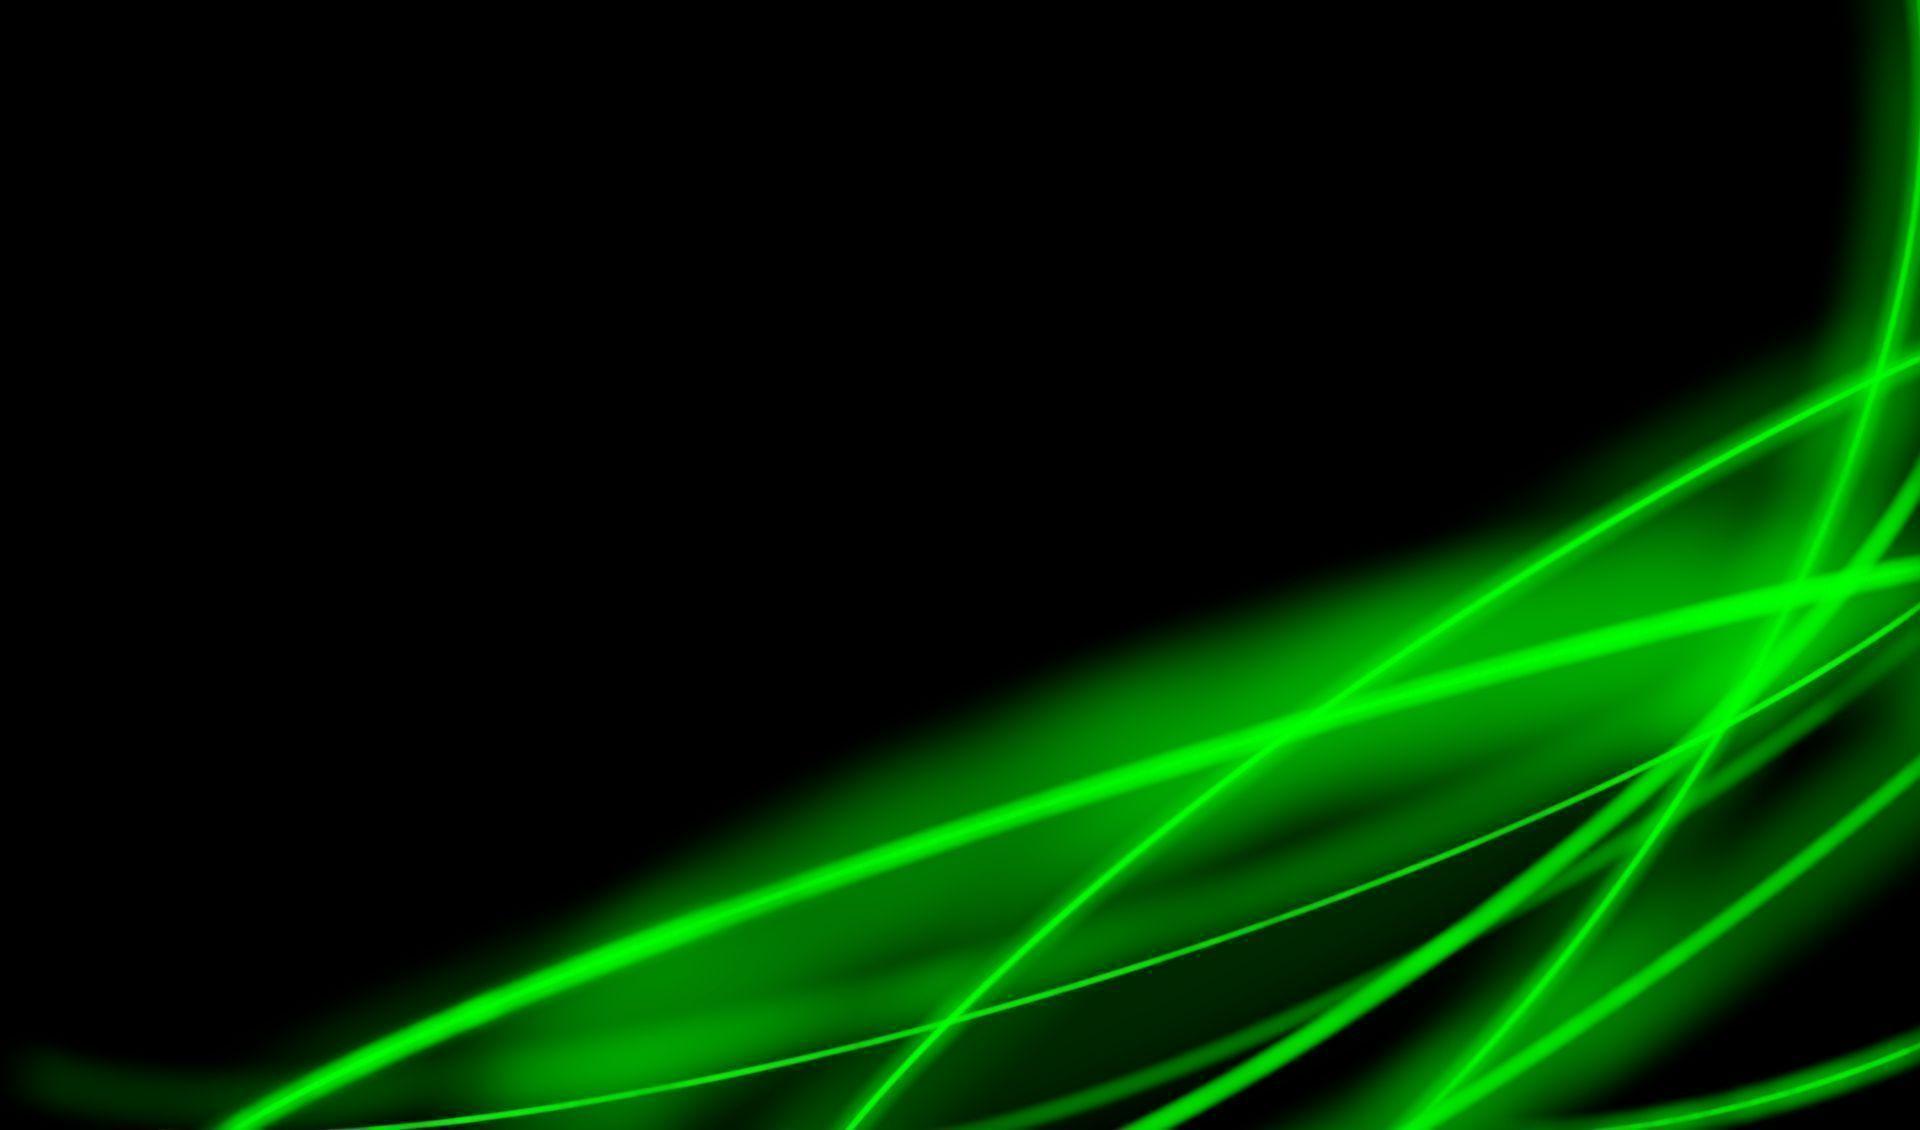 green neon background - photo #27